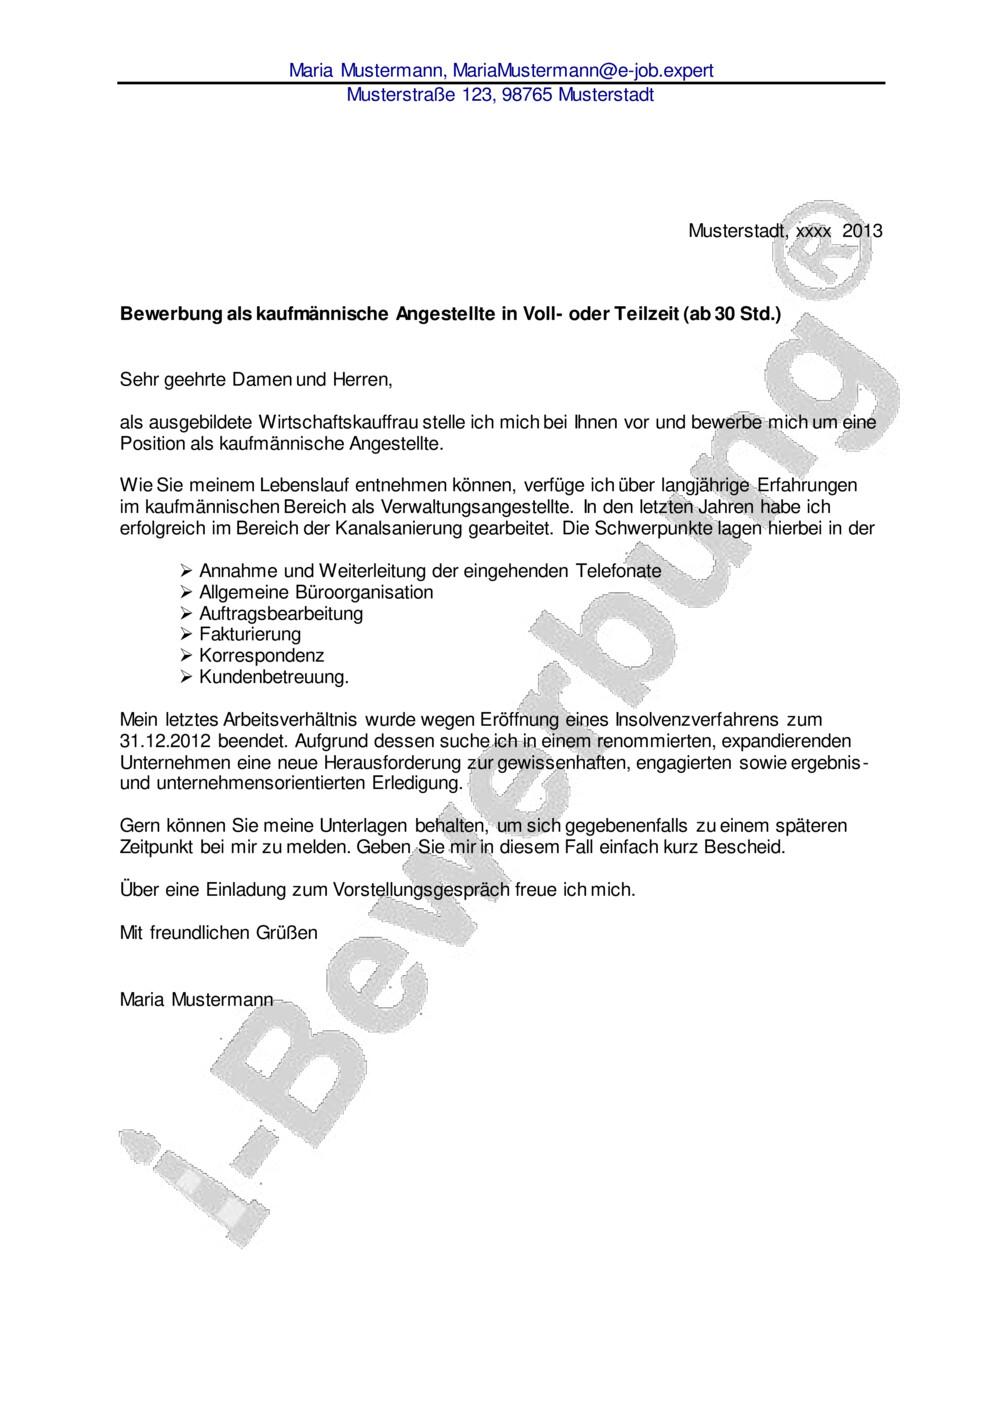 Anschreiben Bewerbung Kaufmannischer Assistent 12